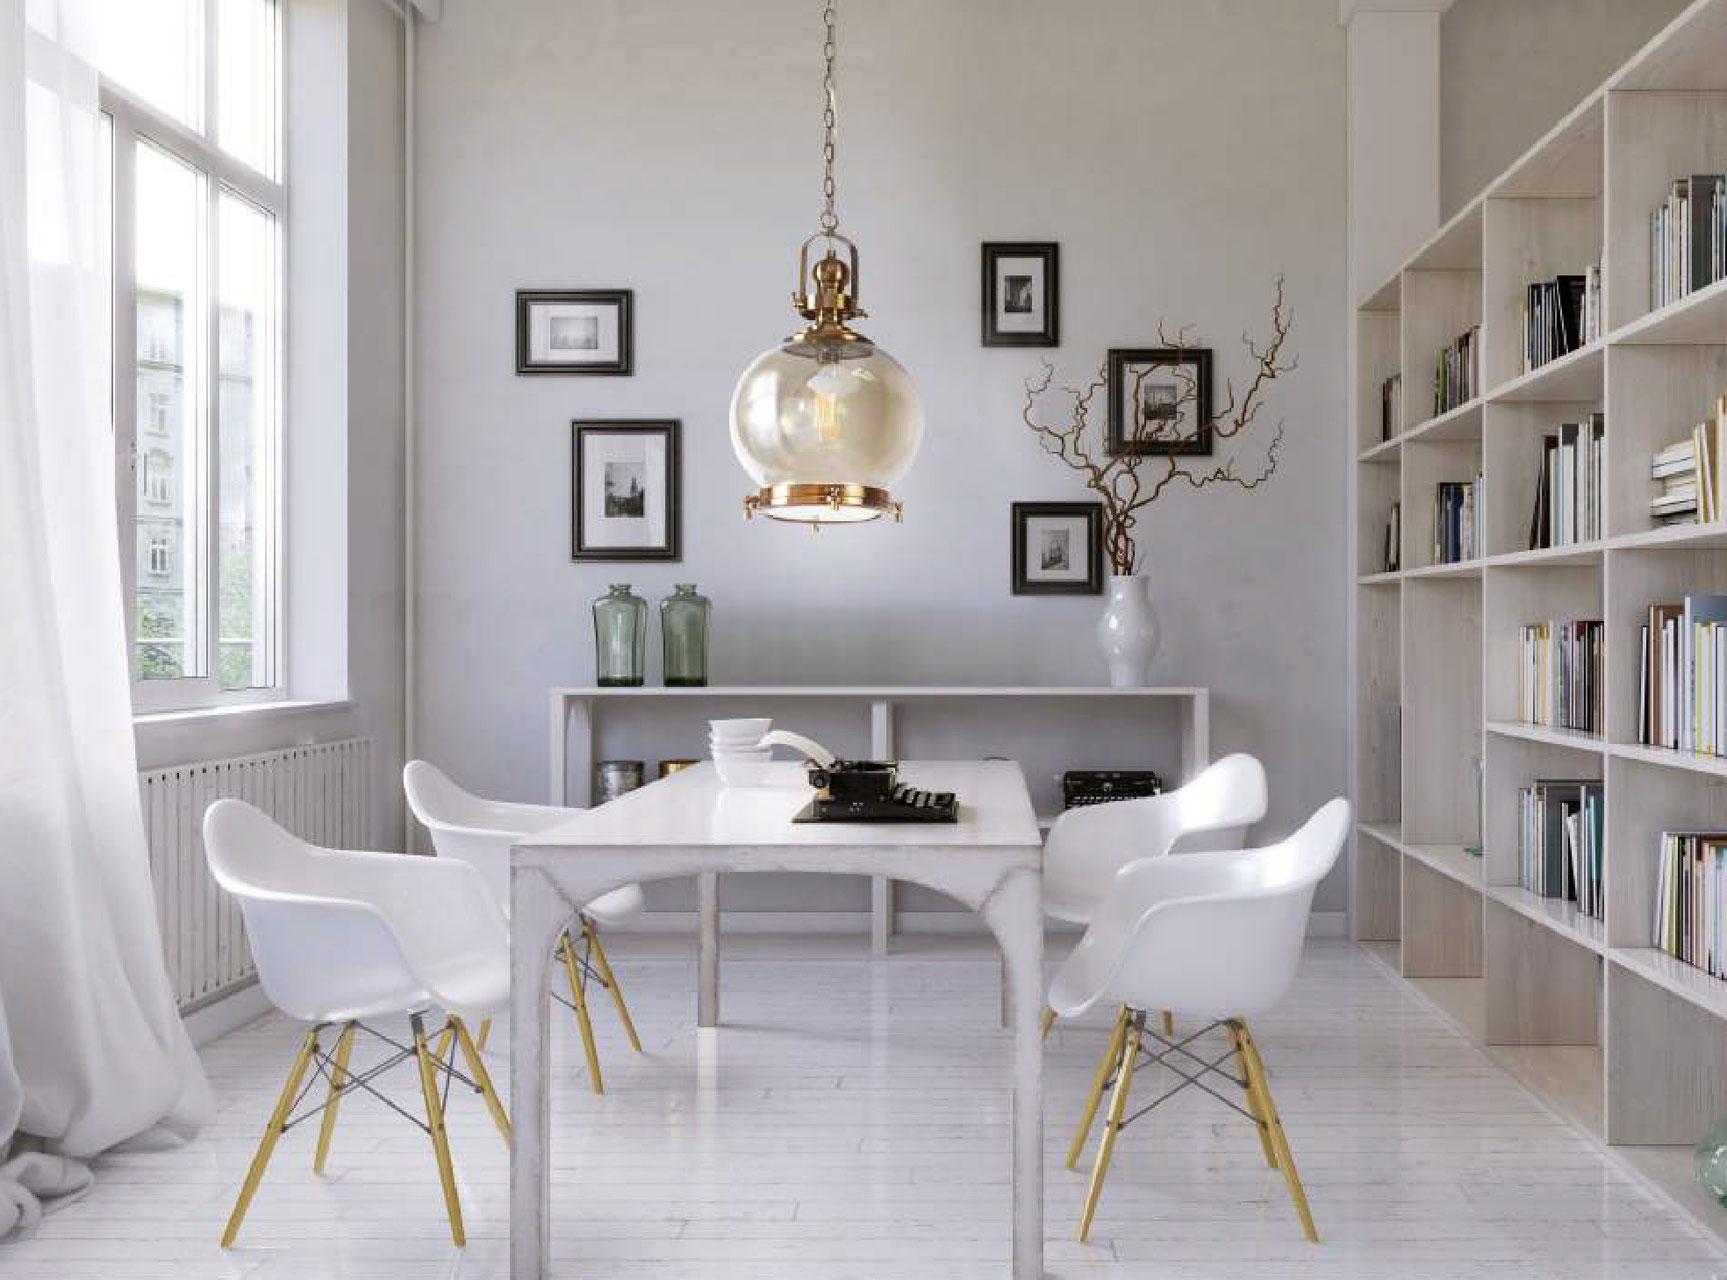 Mantra designerleuchten & lampen lampen shop24